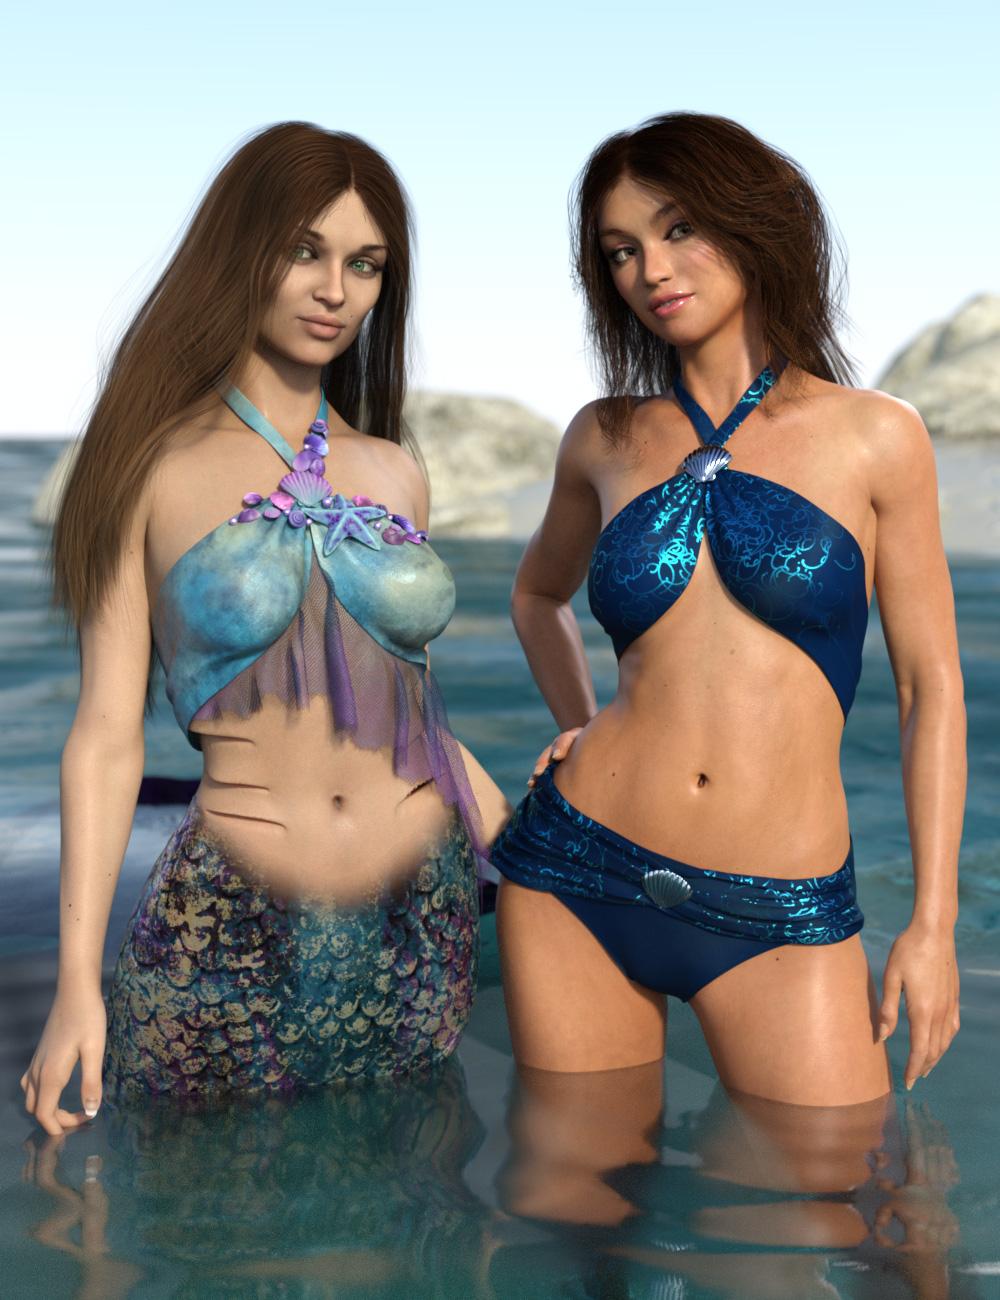 Mermaid Bikini Texture Expansion by: esha, 3D Models by Daz 3D